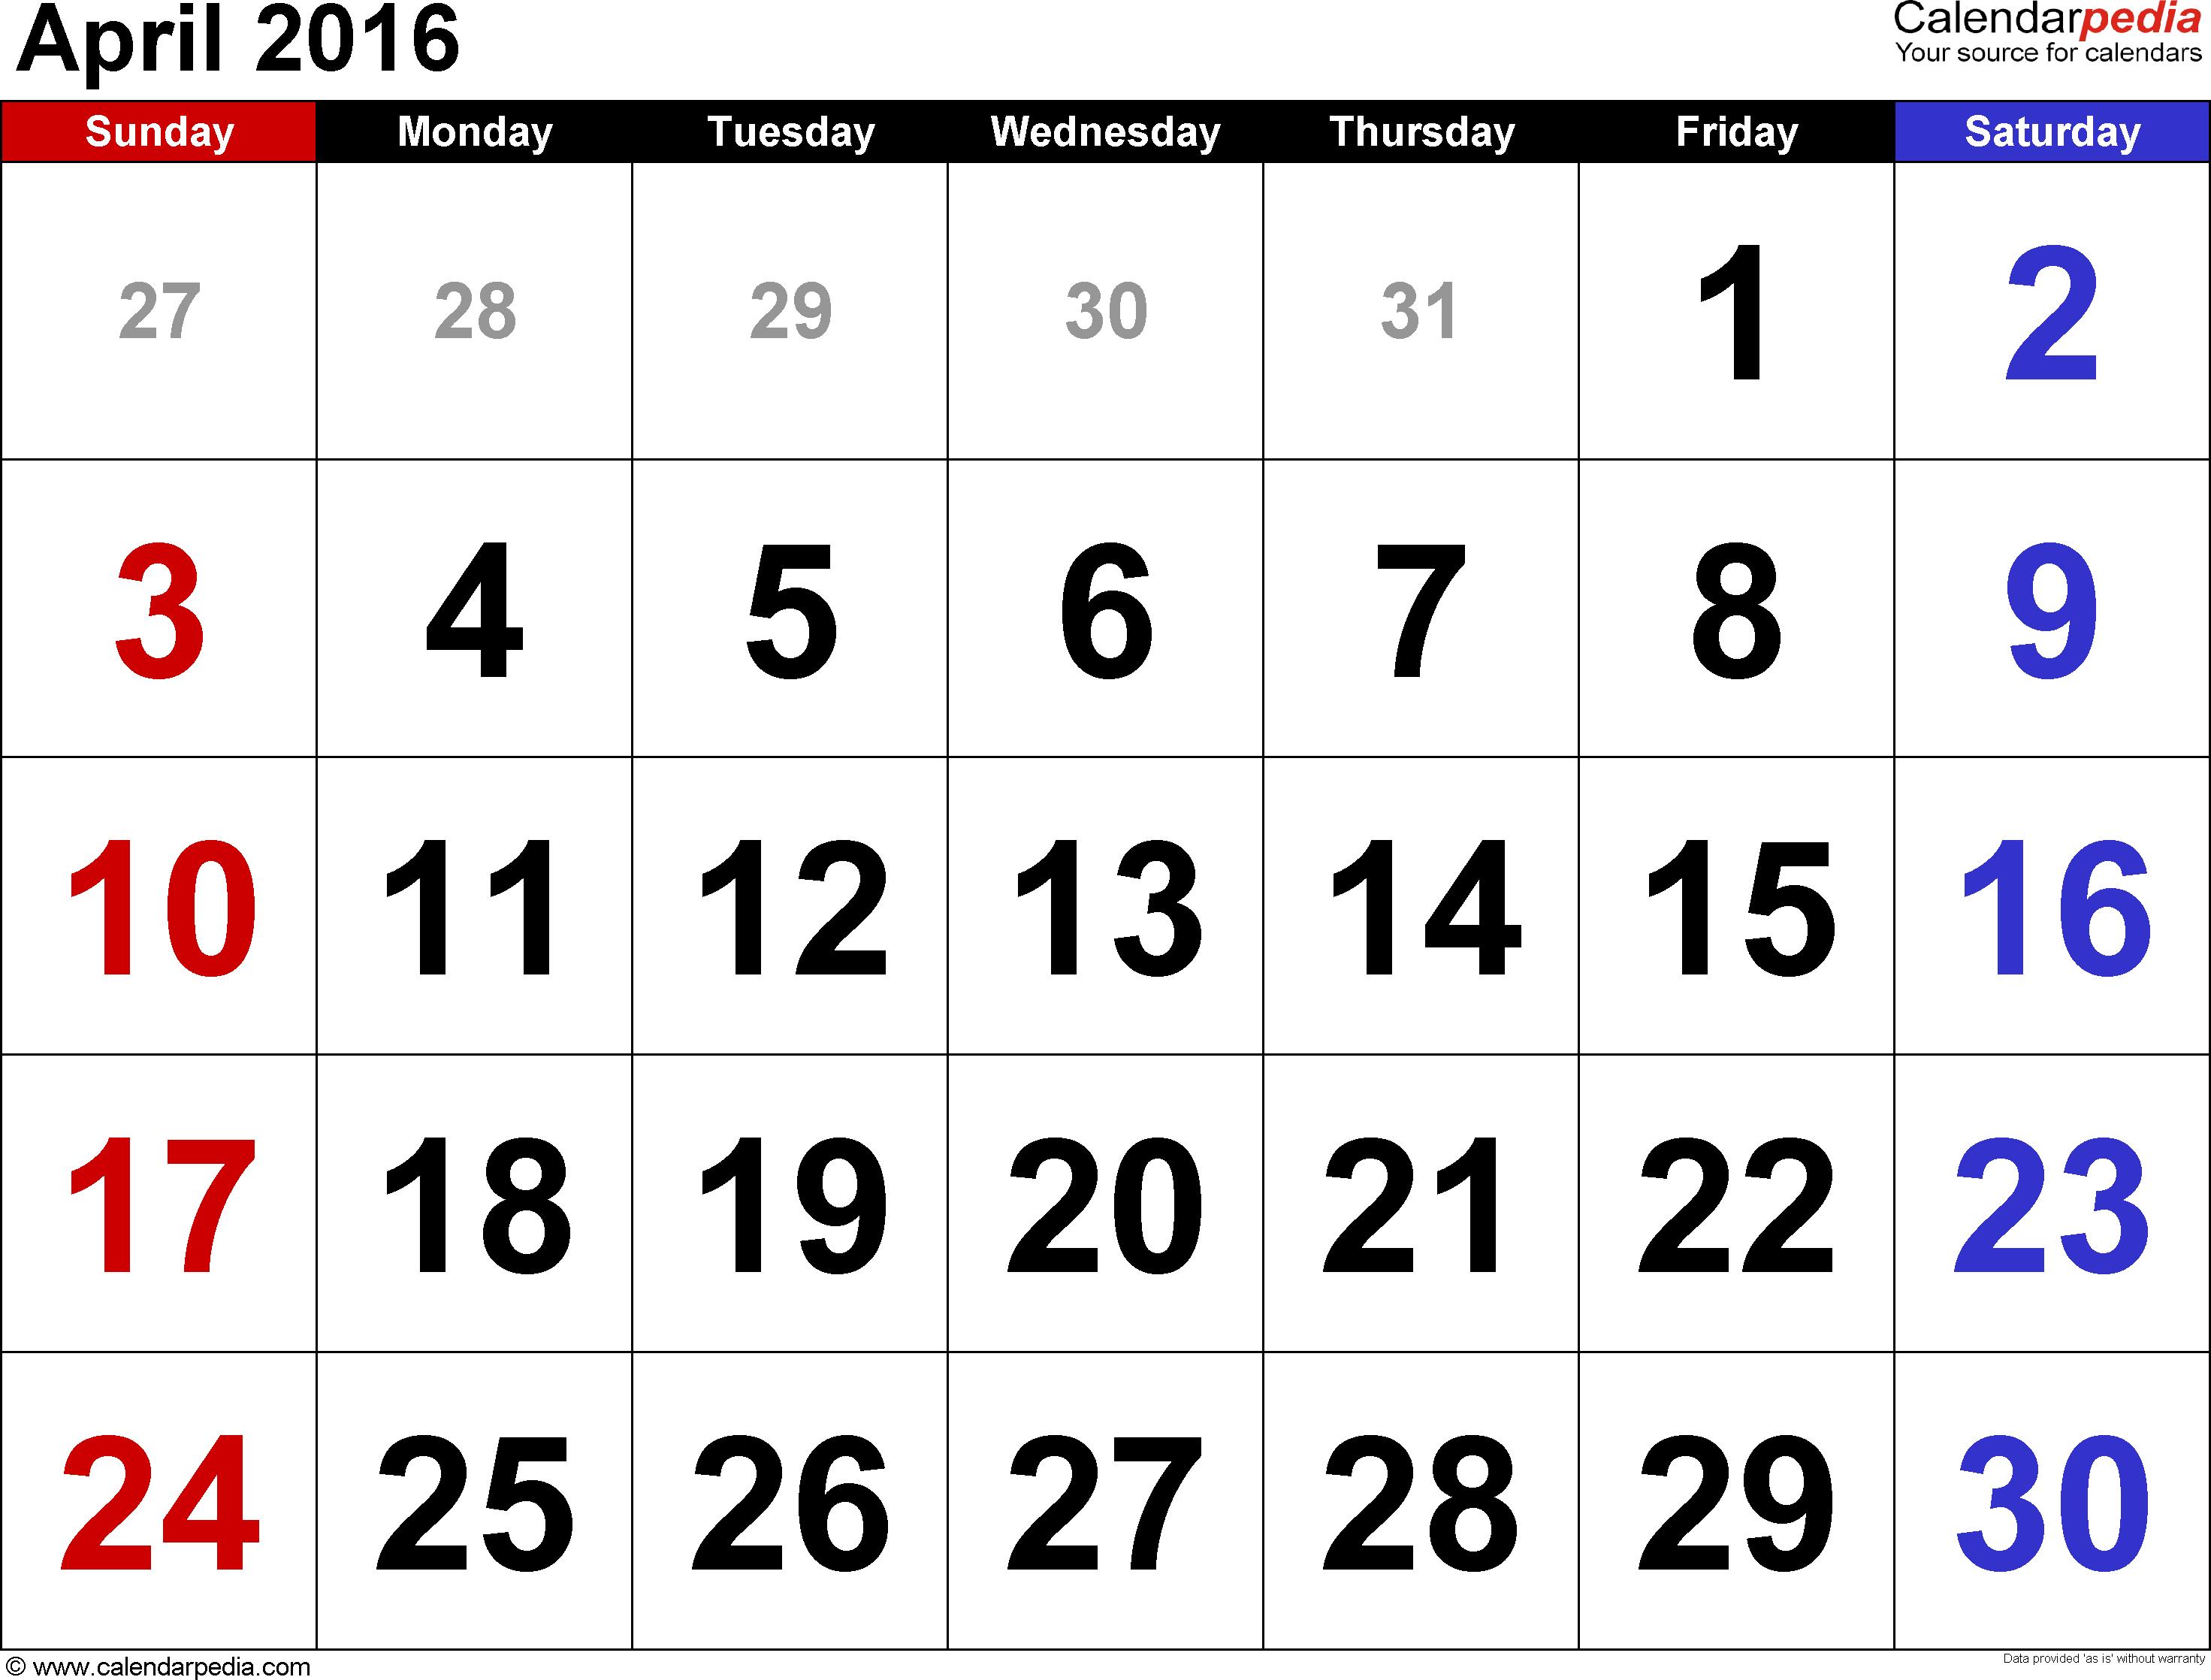 April 2016 calendar clipart clip art library stock April 2016 Calendars for Word, Excel & PDF clip art library stock